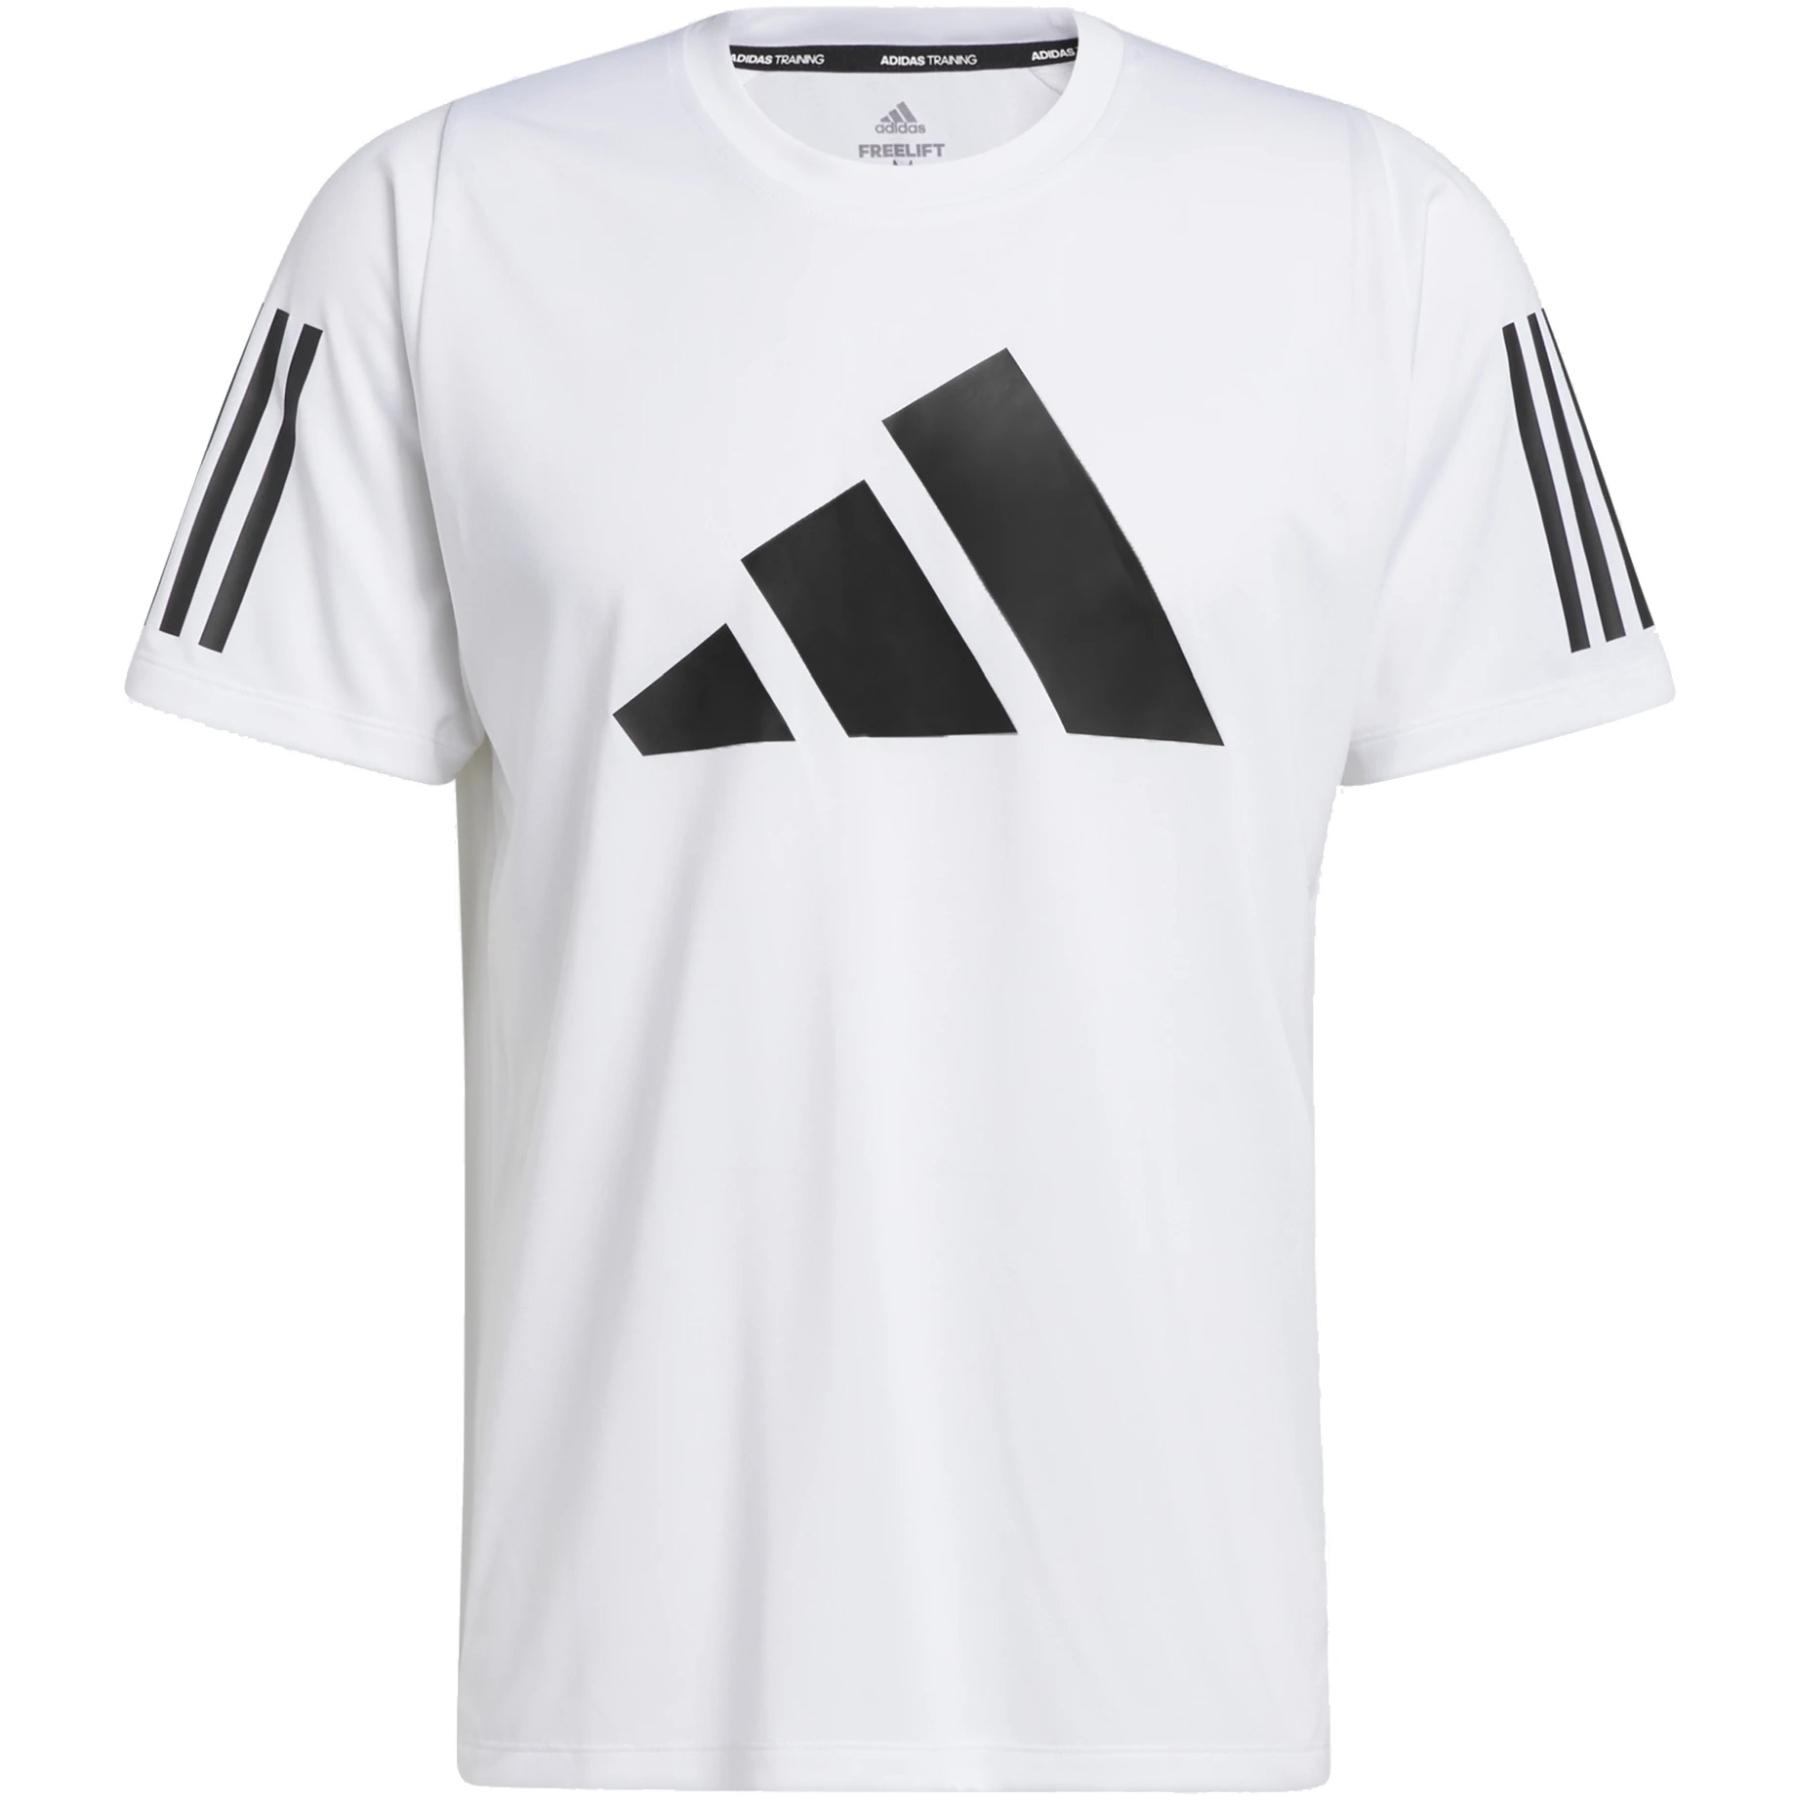 adidas Men's FreeLift Tee Shirt - white GL8919